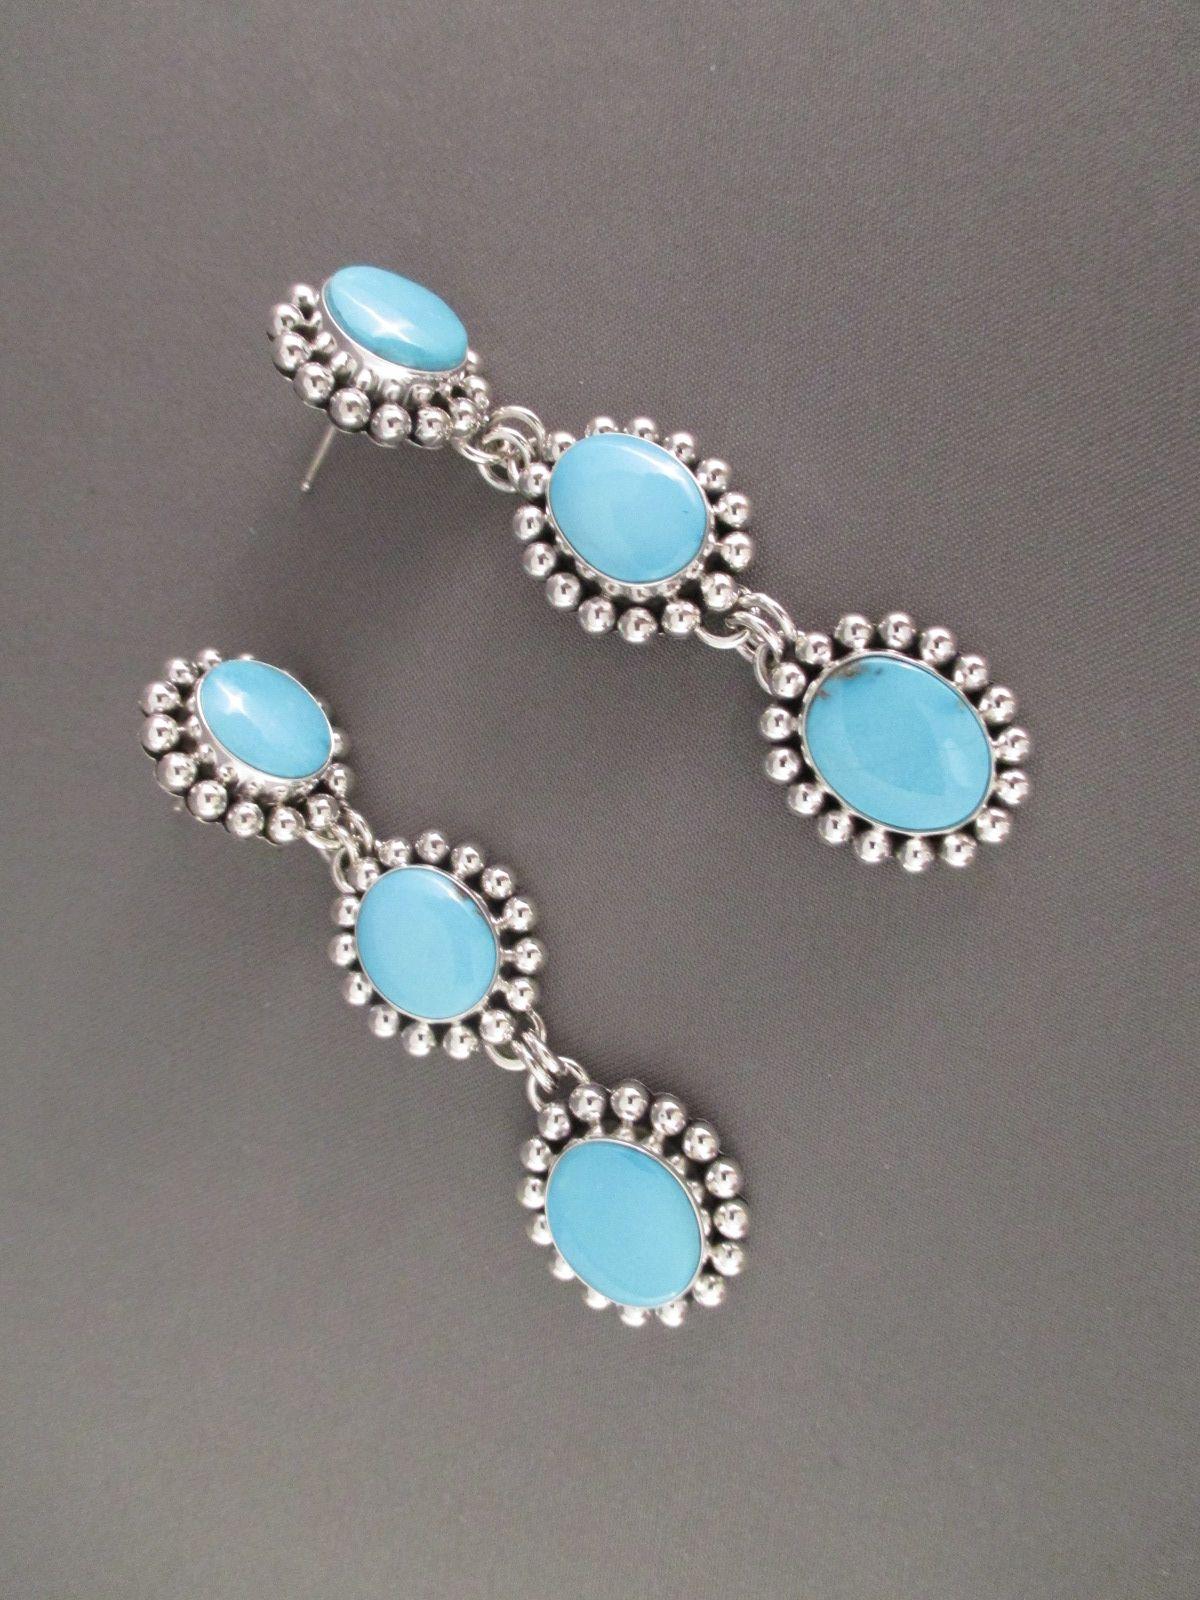 3-Tier Sleeping Beauty Turquoise Earrings by Native American (Navajo) jewelry artist, Artie Yellowhorse $665-